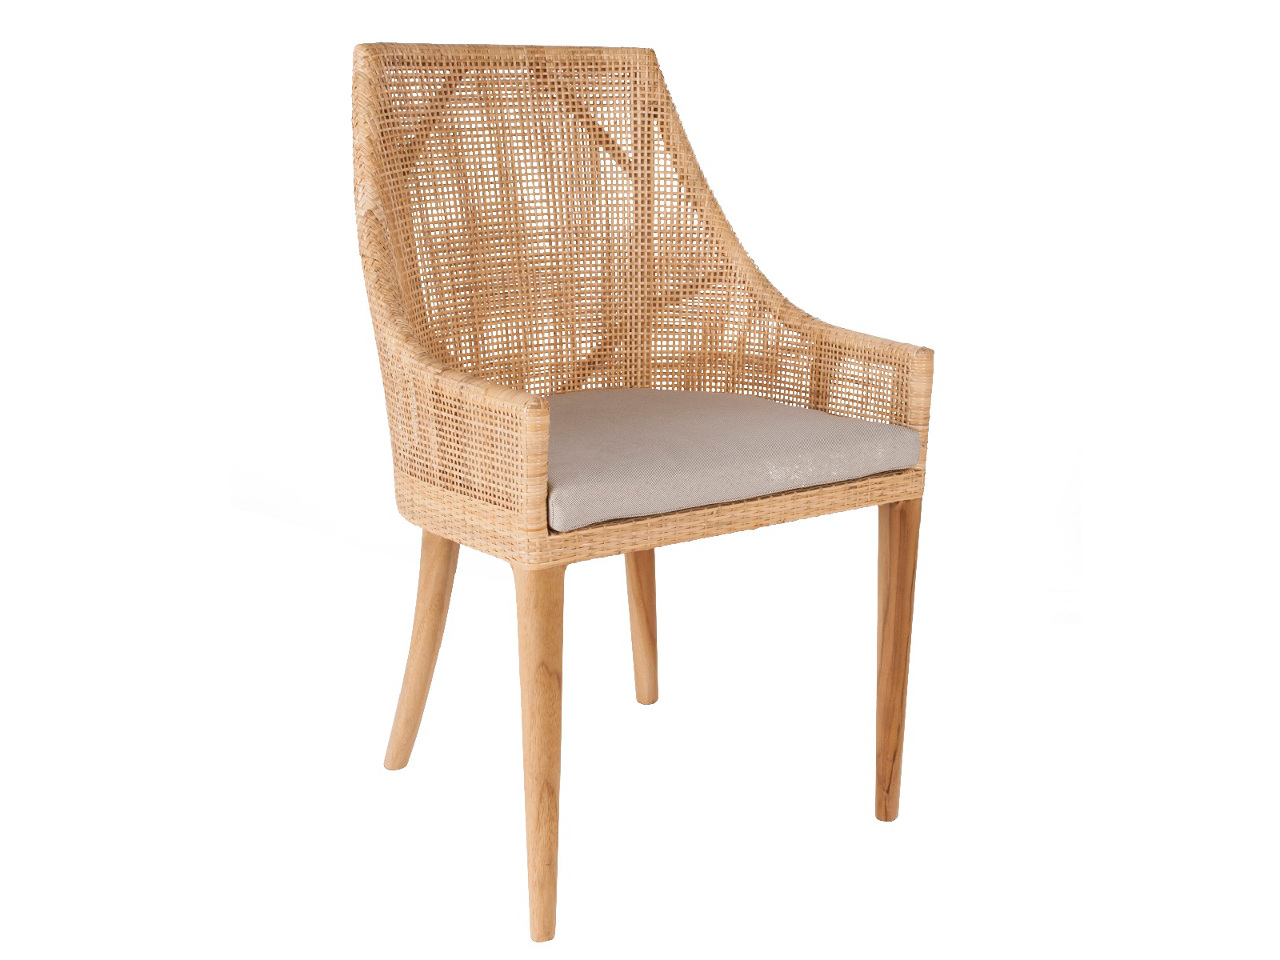 Chaise bohème et naturelle - SAIGON - Kayumanis